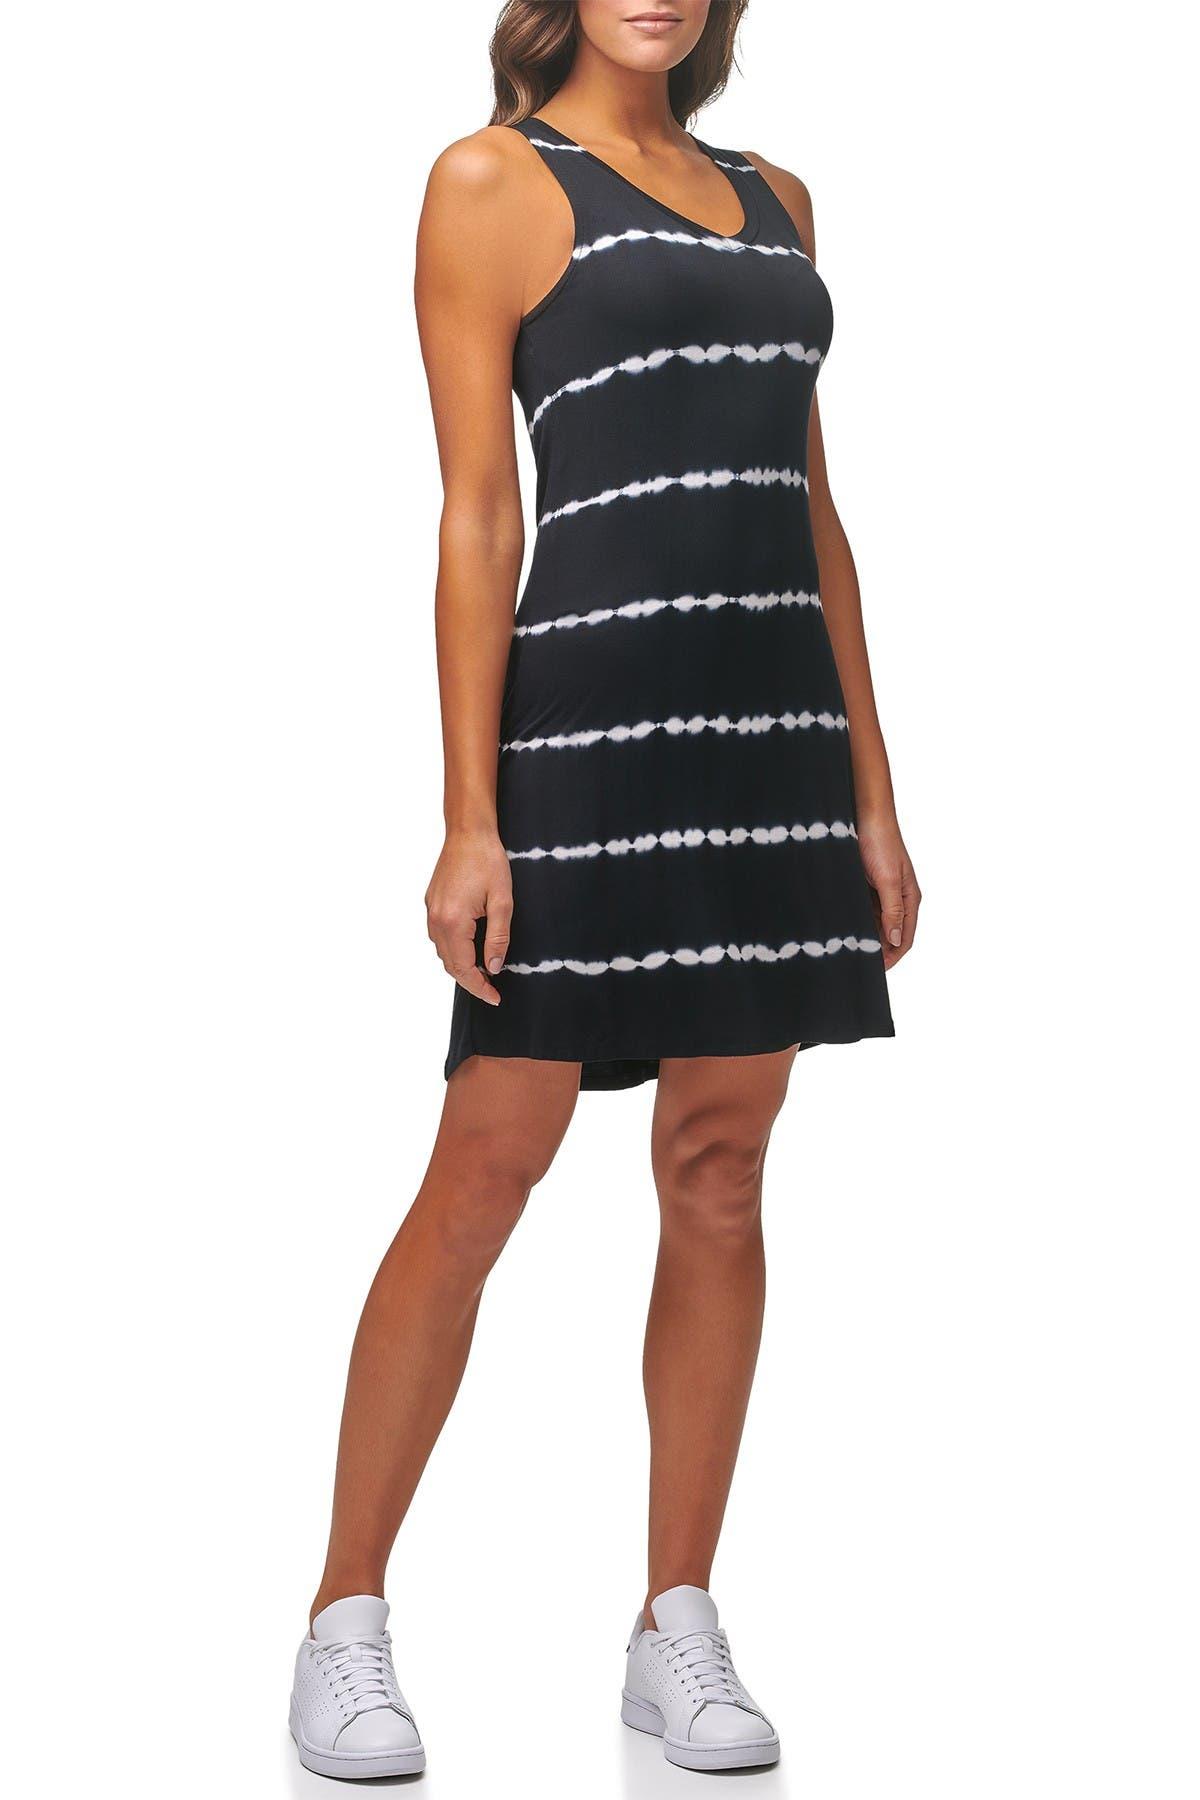 Image of MARC NEW YORK PERFORMANCE Tie Dye V-Neck Sleeveless A-Line Dress